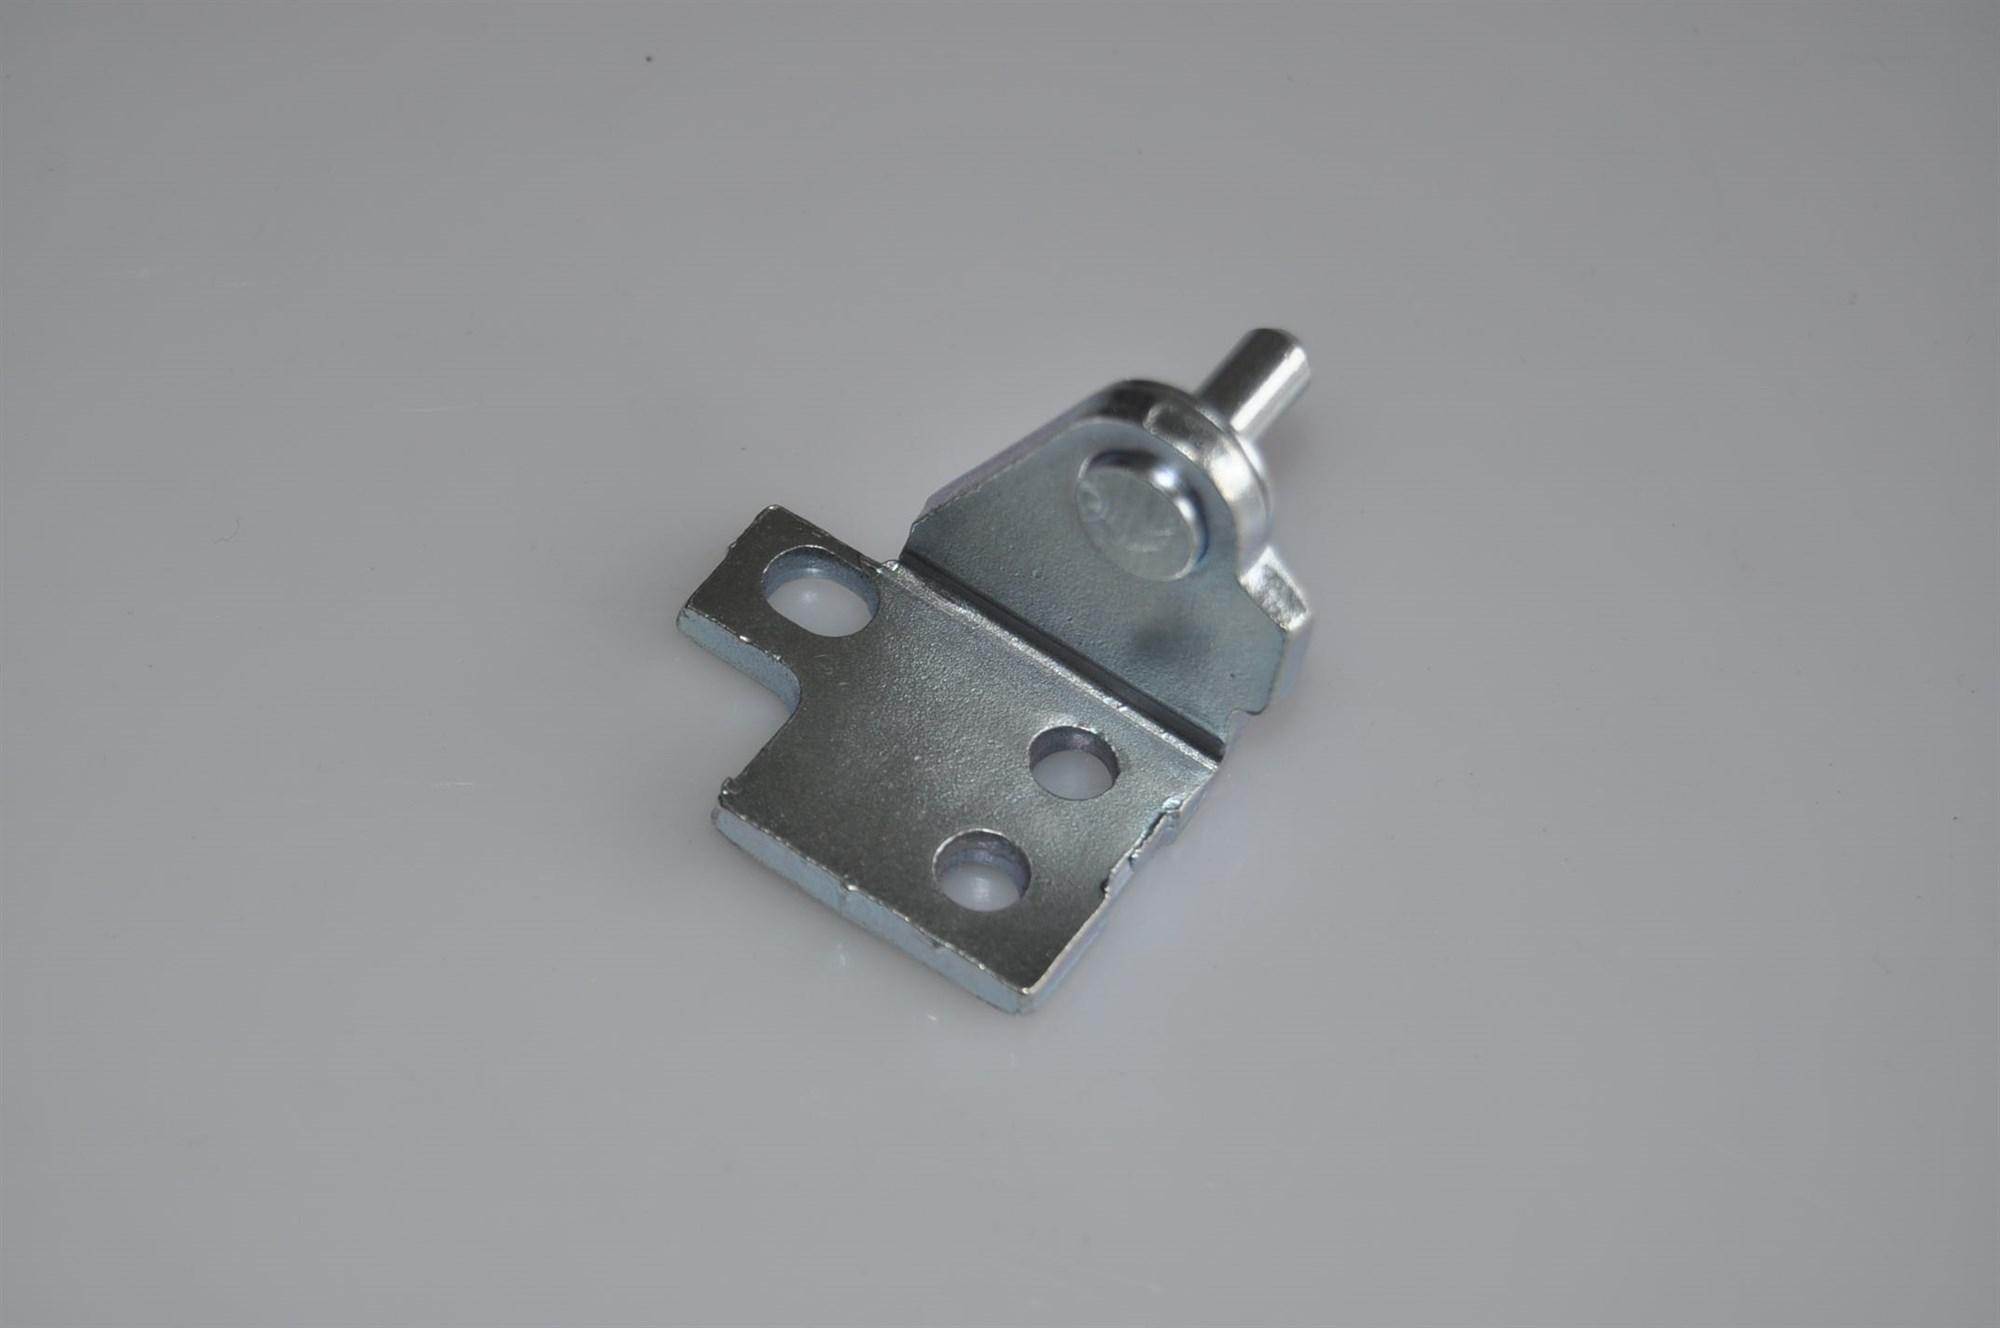 Gorenje Kühlschrank Lampe : Scharnier gorenje kühl gefrierschrank unten rechts